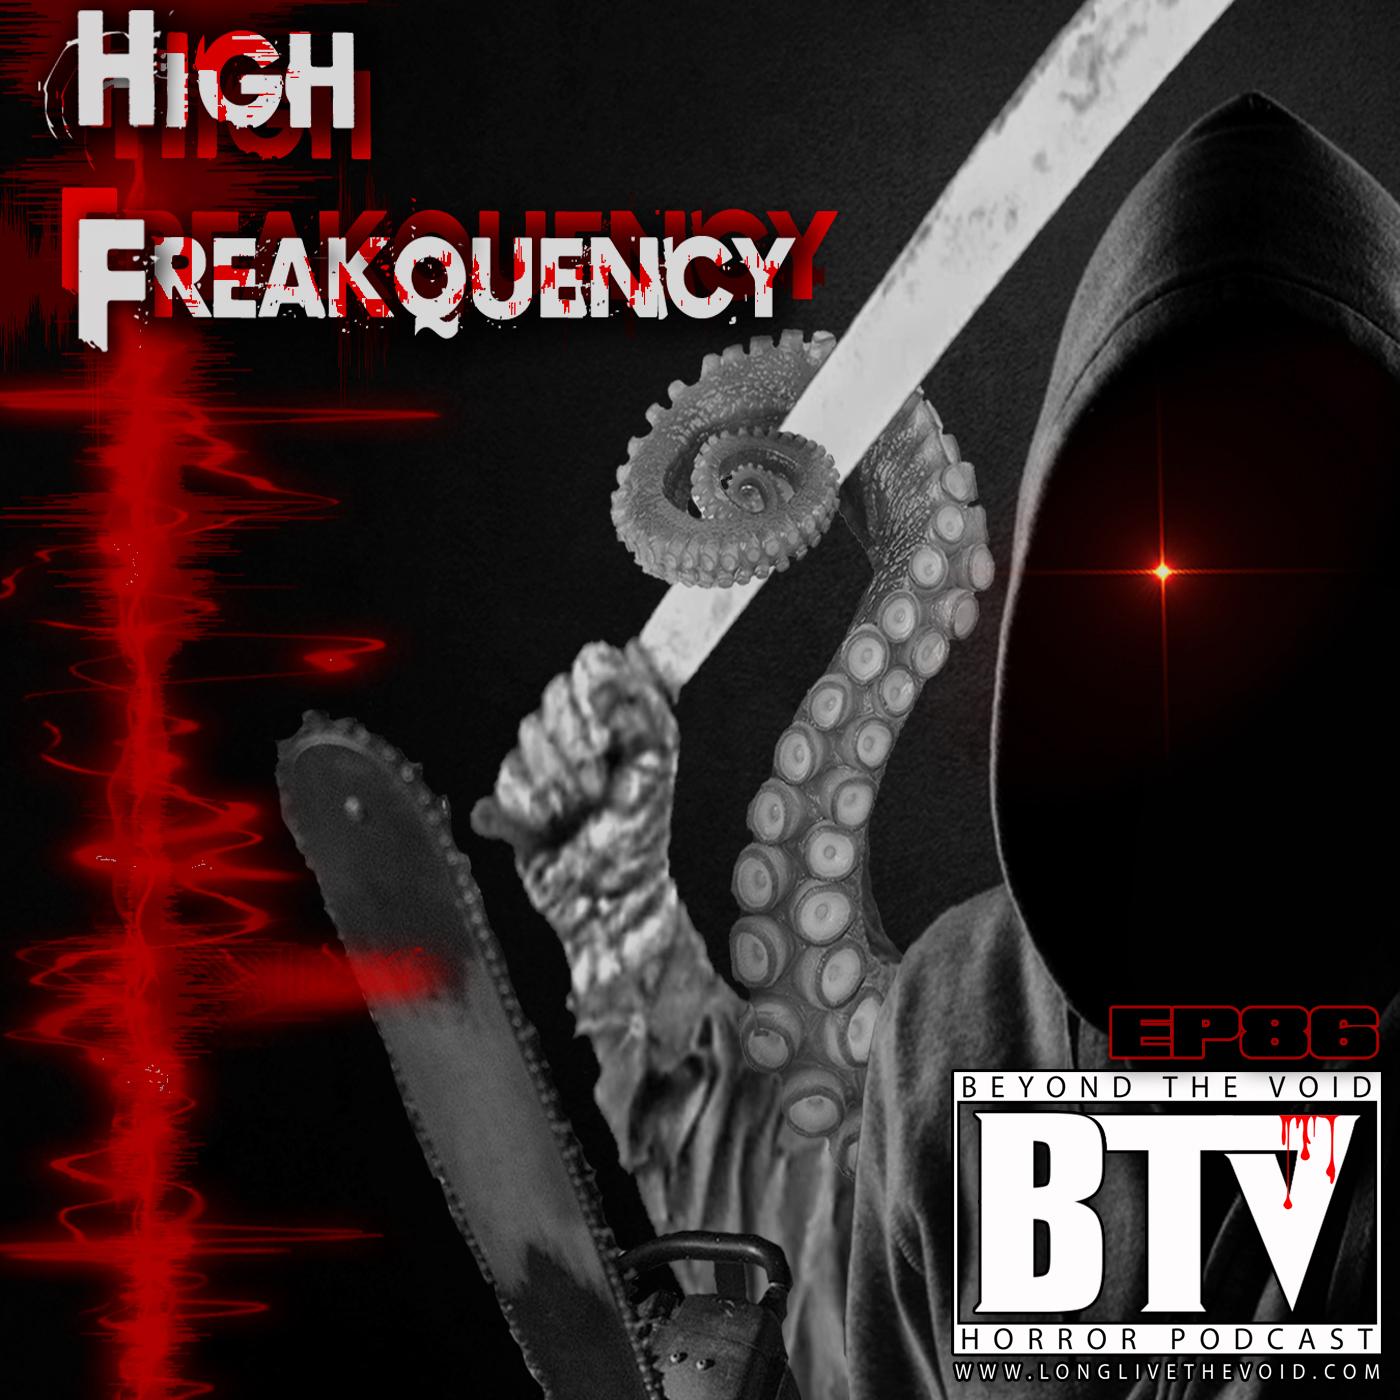 1final14x14-HighFreak-cover.jpg